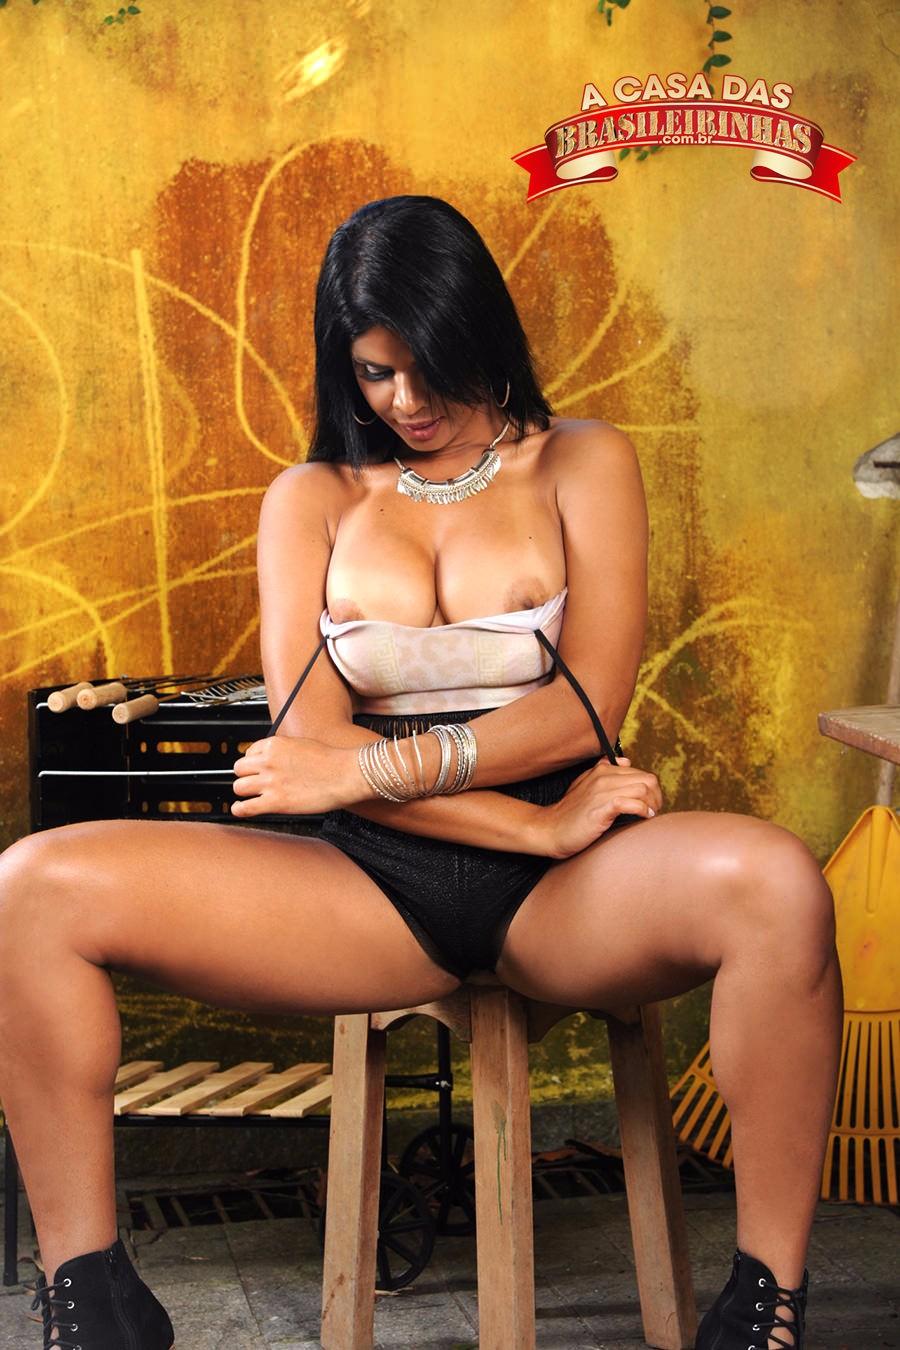 Juliana-Ramos-tirando-a-roupa.jpg